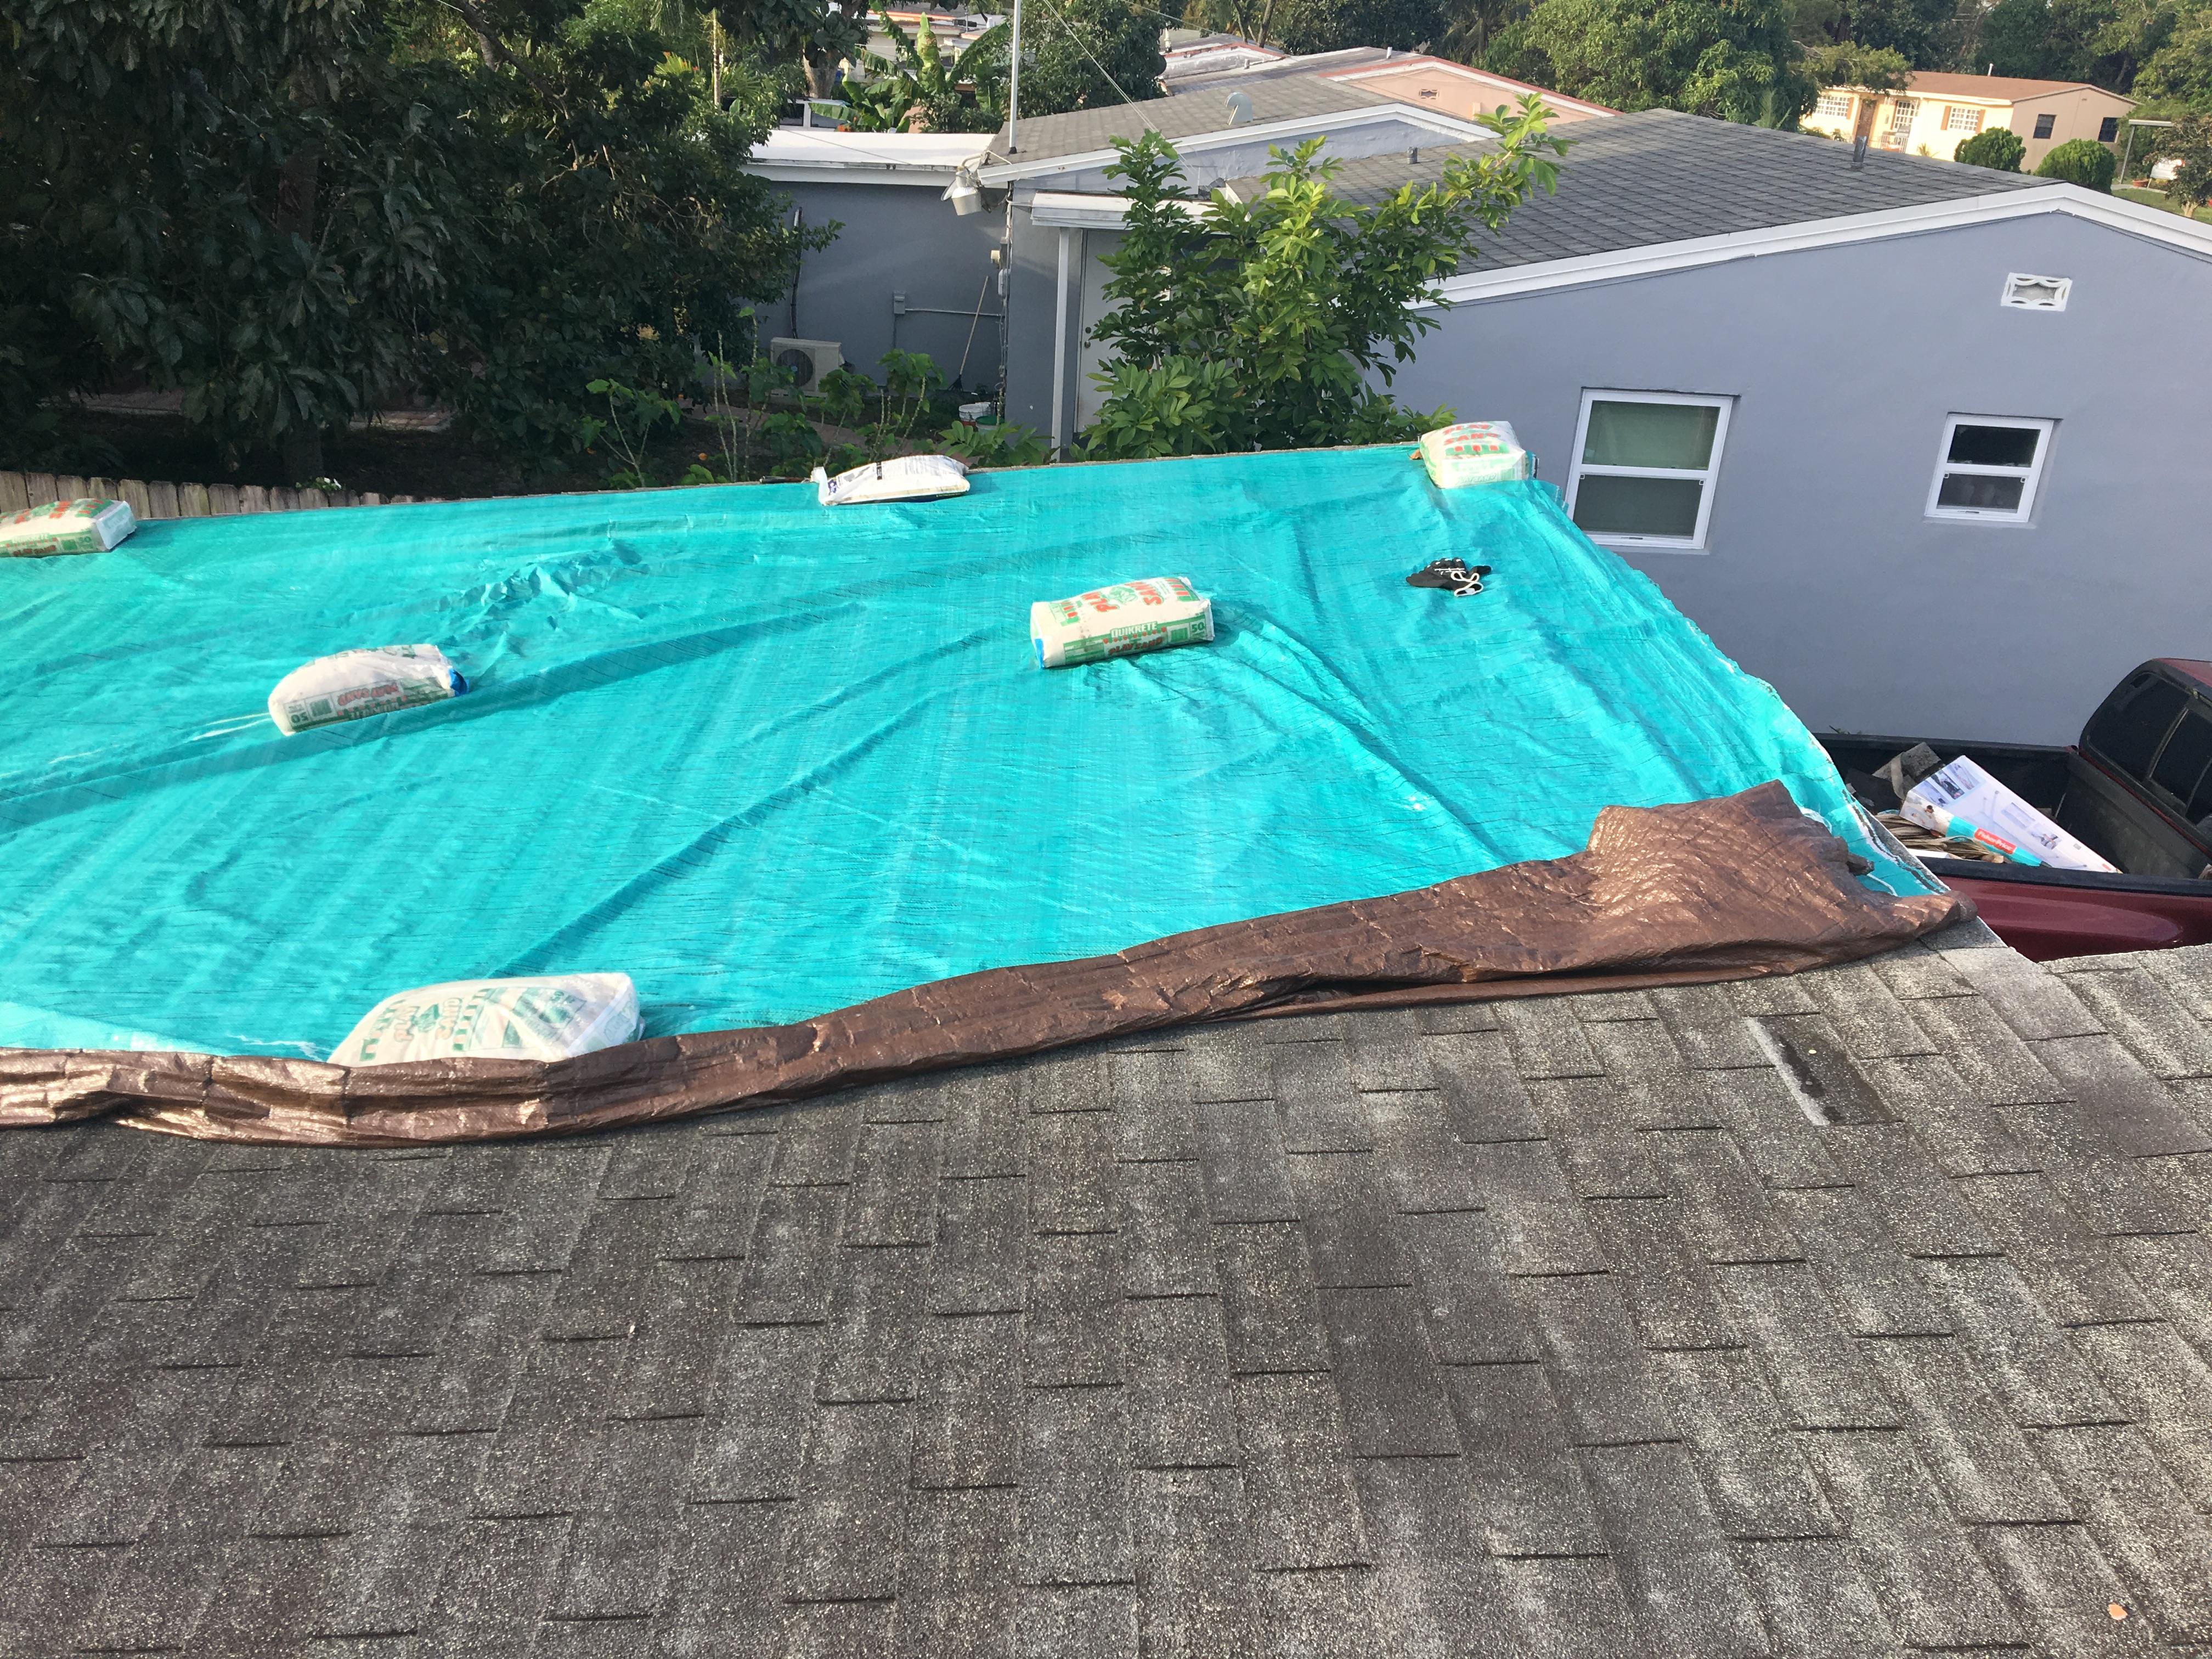 EE&G Restoration Orlando Water Damage, Fire Damage, Mold Remediation & Removal image 10